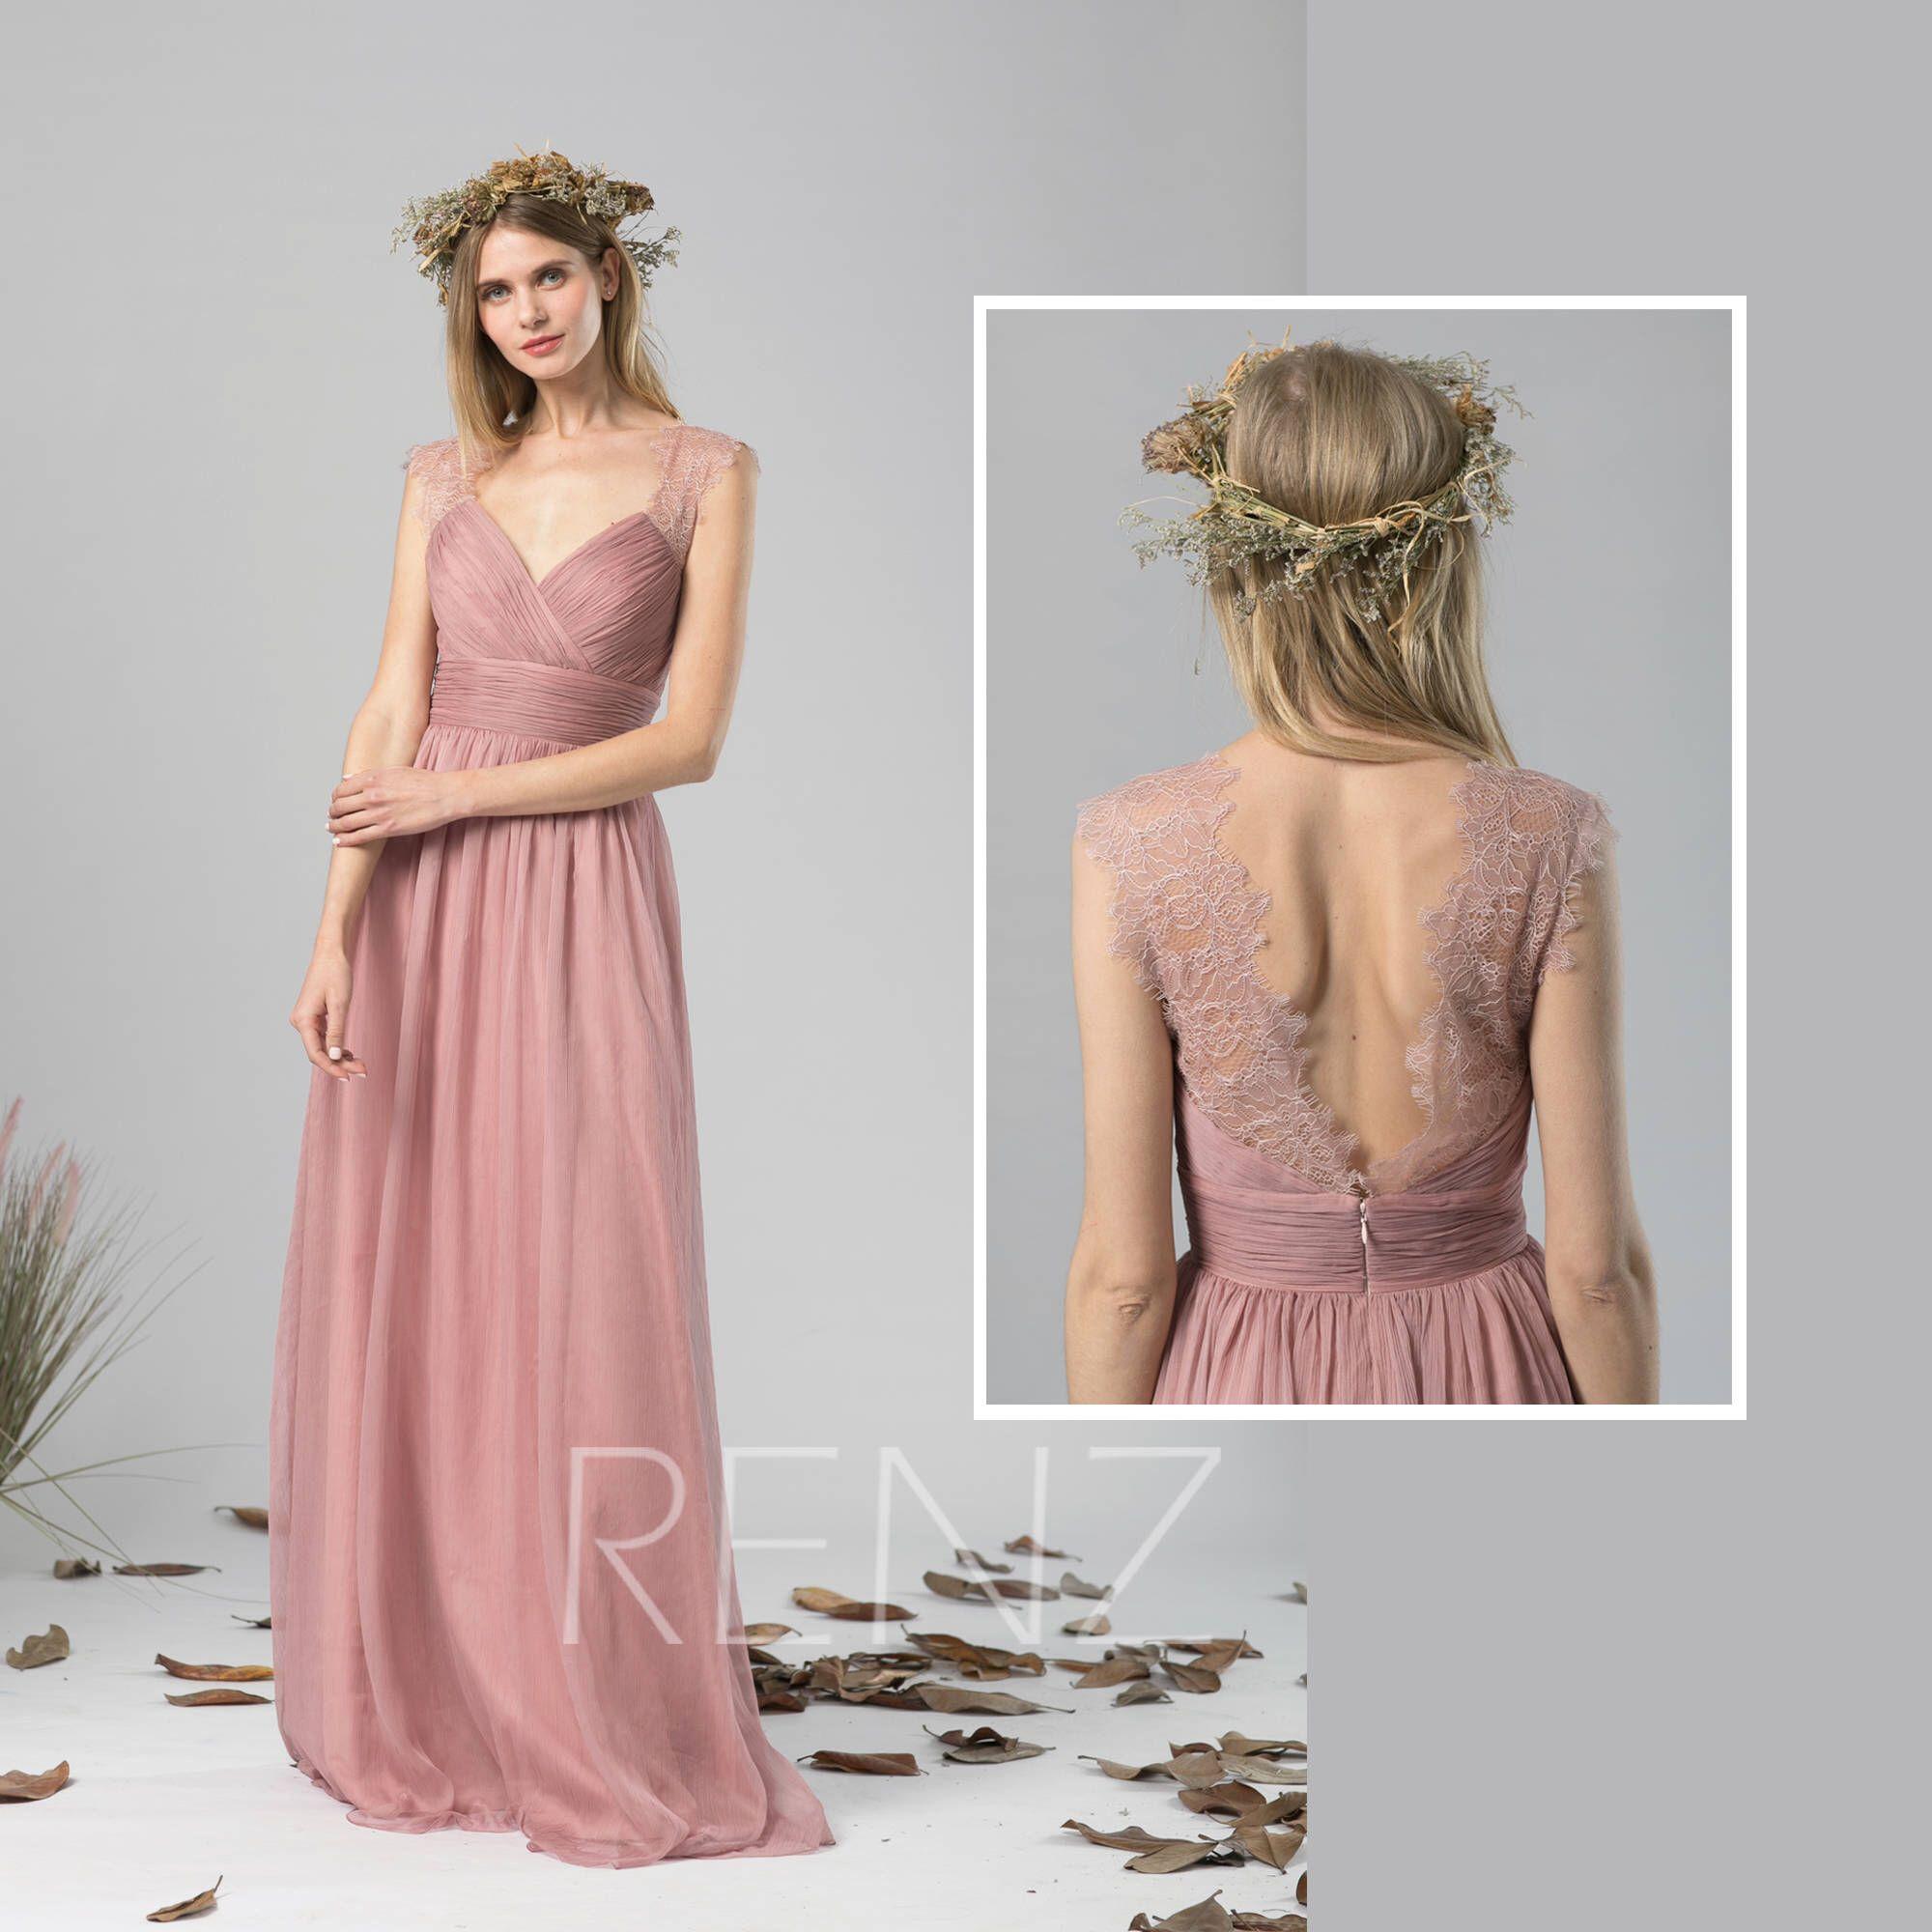 Bridesmaid Dress Dusty Rose Chiffon Dress Wedding Dress,Ruched V Neck Maxi  Dress,Illusion Back Party Dress,Sleeveless Evening Dress(L422)